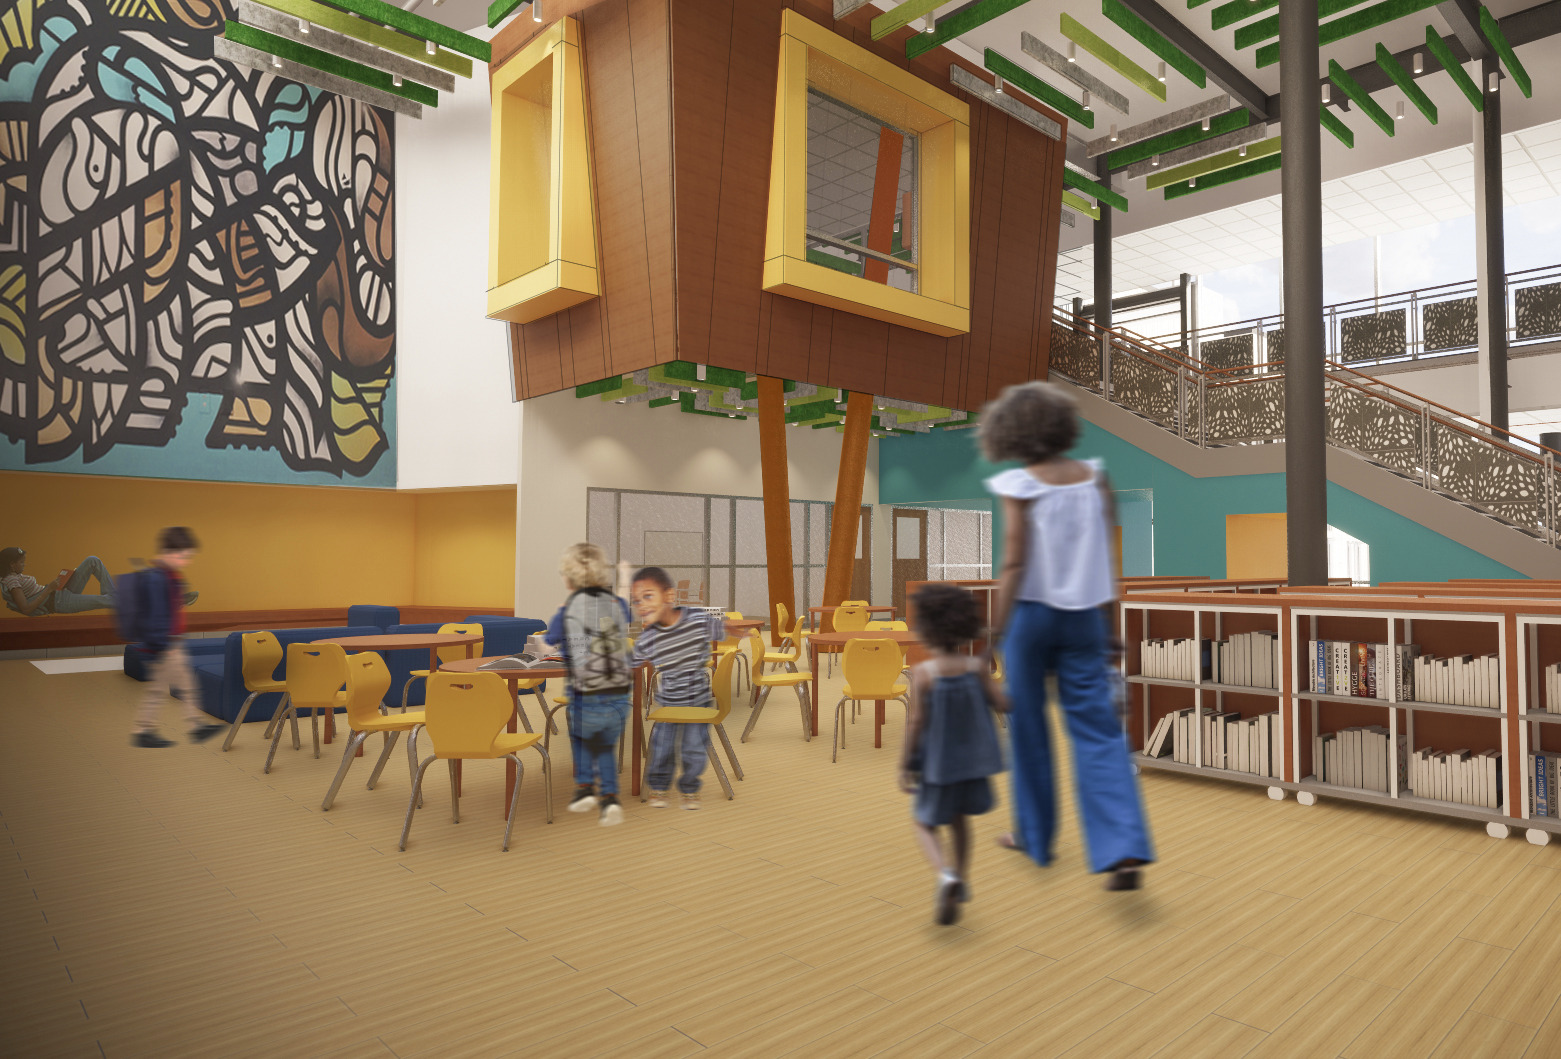 West Elementary School, Washington, D.C.